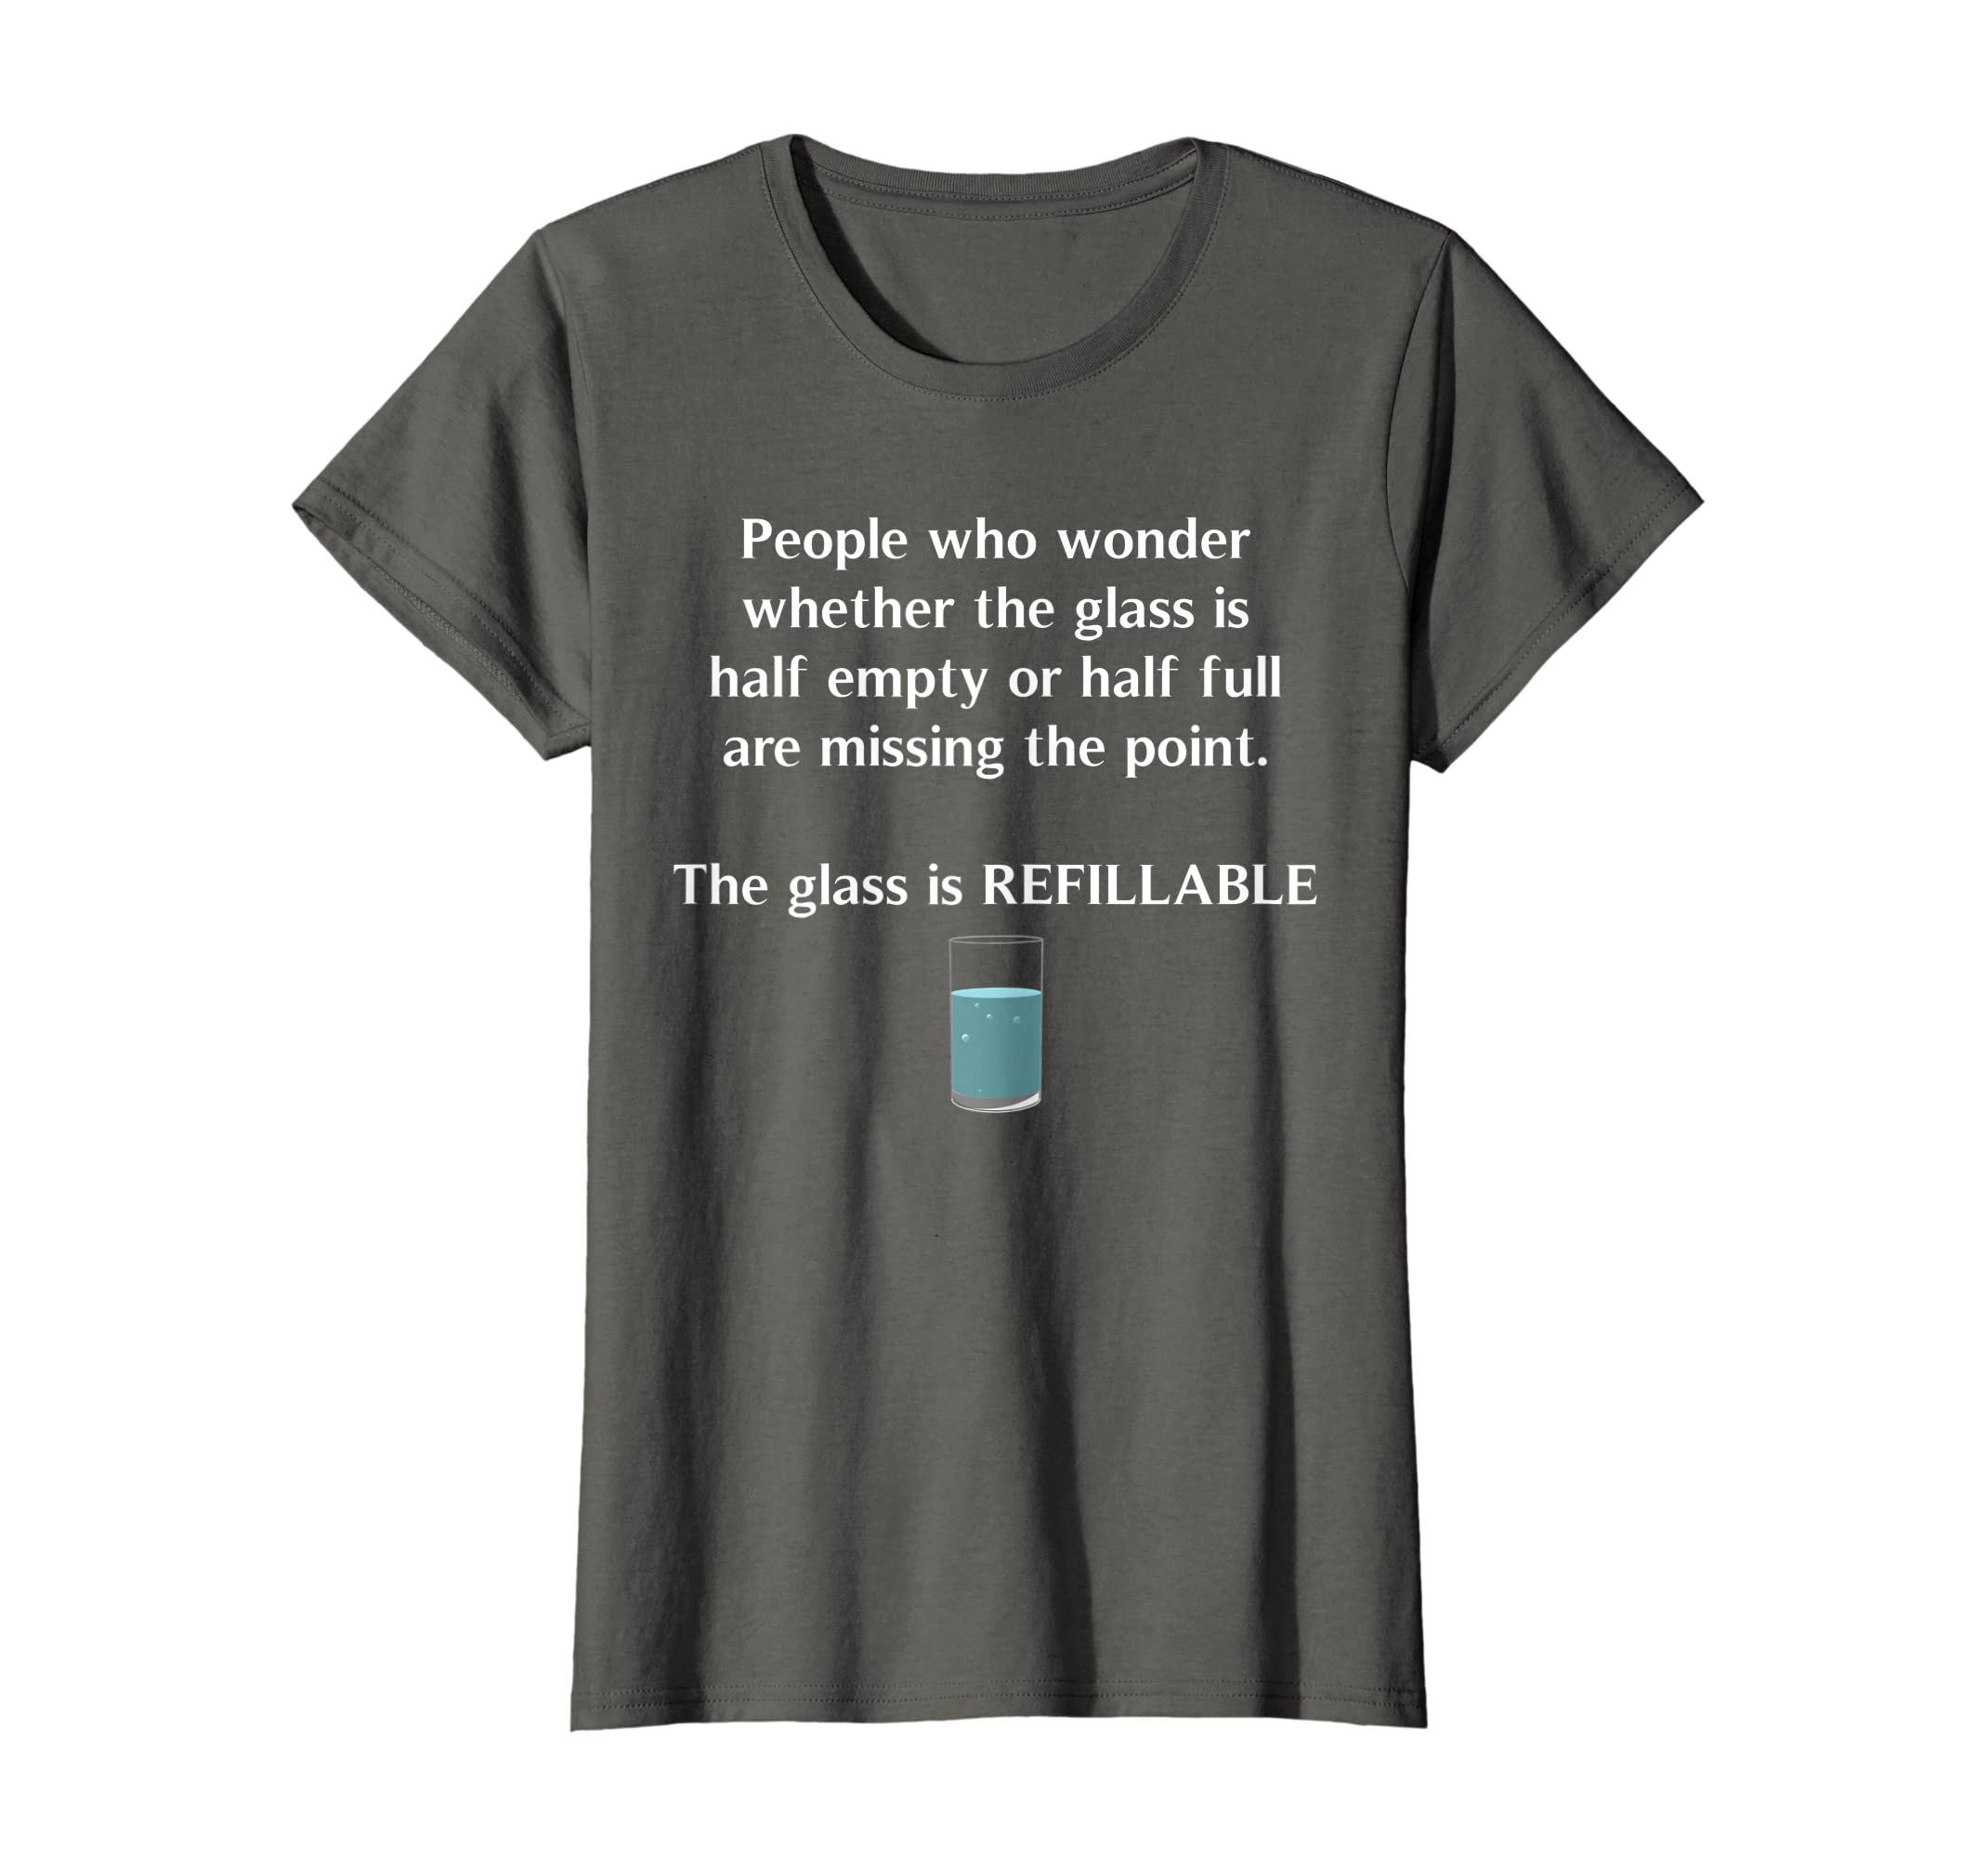 c0d52e52 Amazon.com: Glass Half Full Half Empty Refillable Positivity T-Shirt:  Clothing